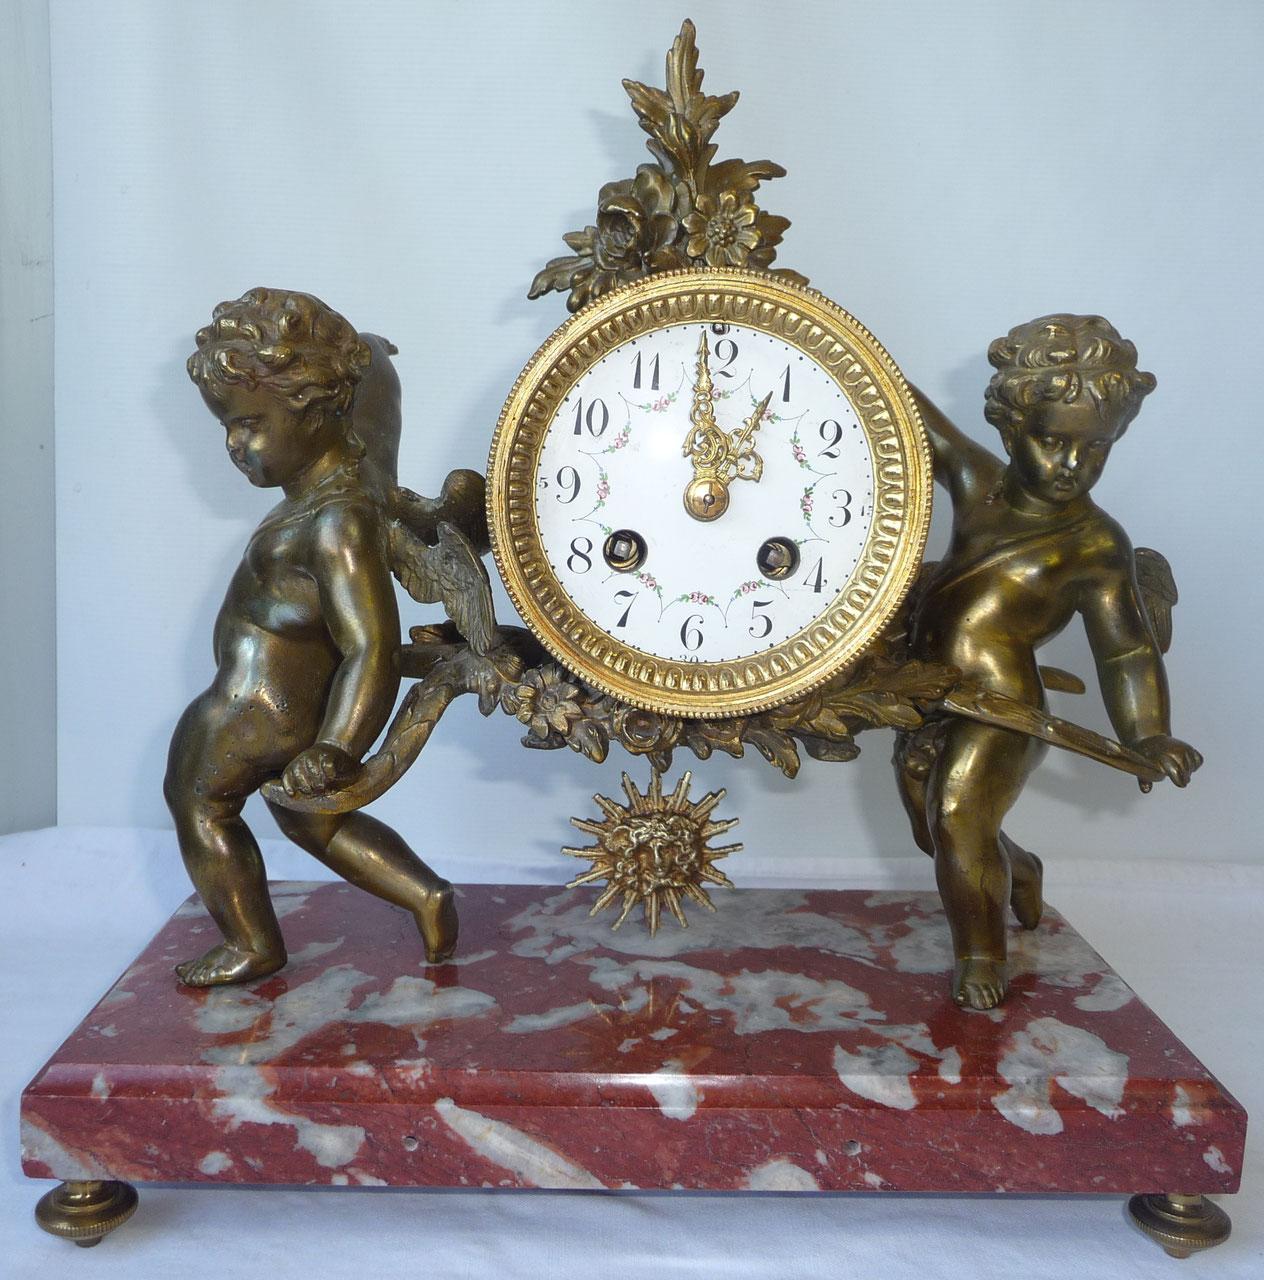 horloge pendule comtoise antiquit s edelweiss. Black Bedroom Furniture Sets. Home Design Ideas